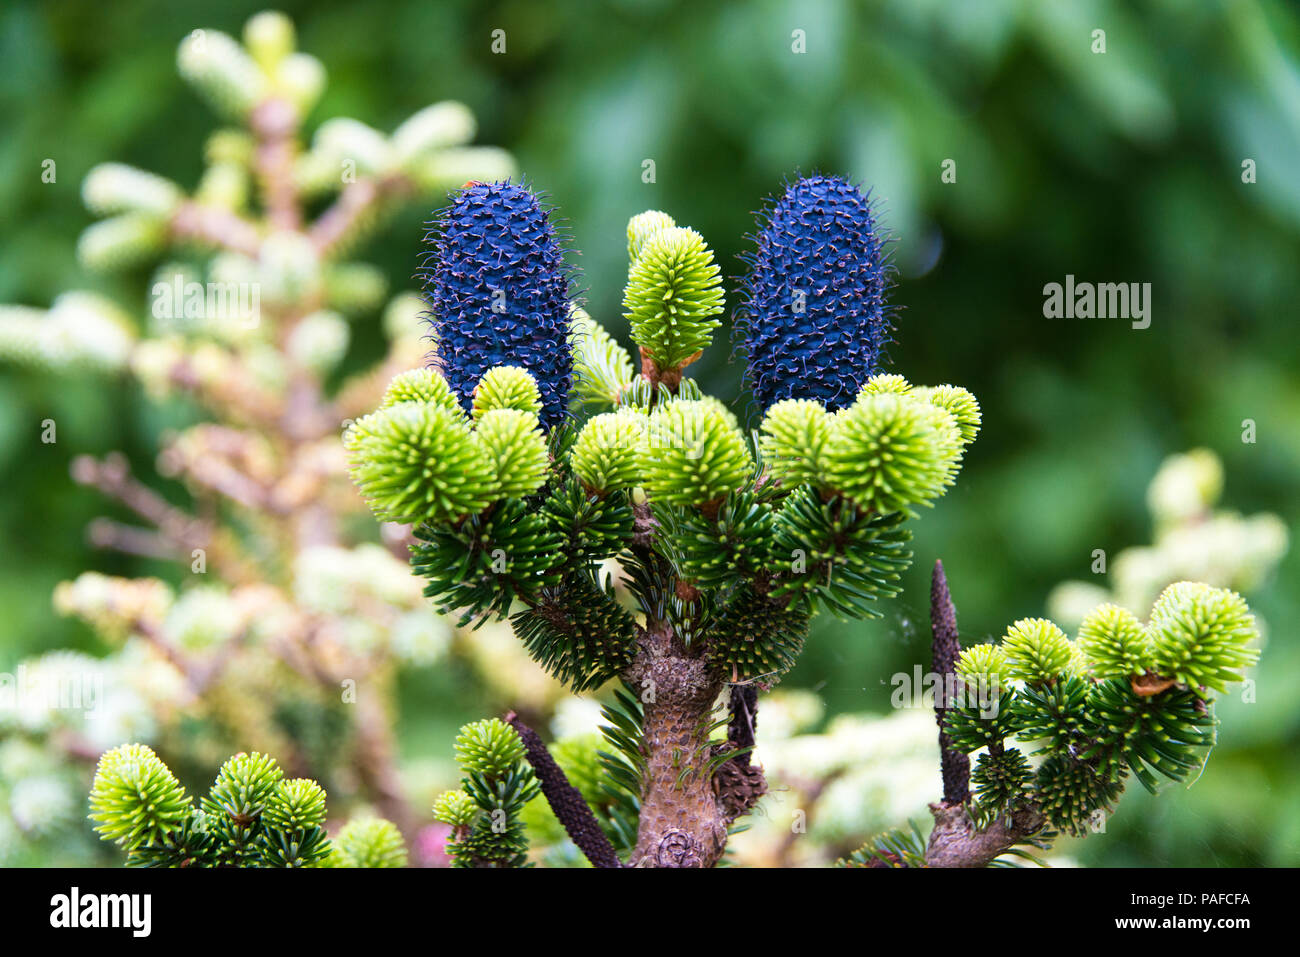 Small Fir Plant Abies Delavayi Buchananfamily Pinacae Stock Photo